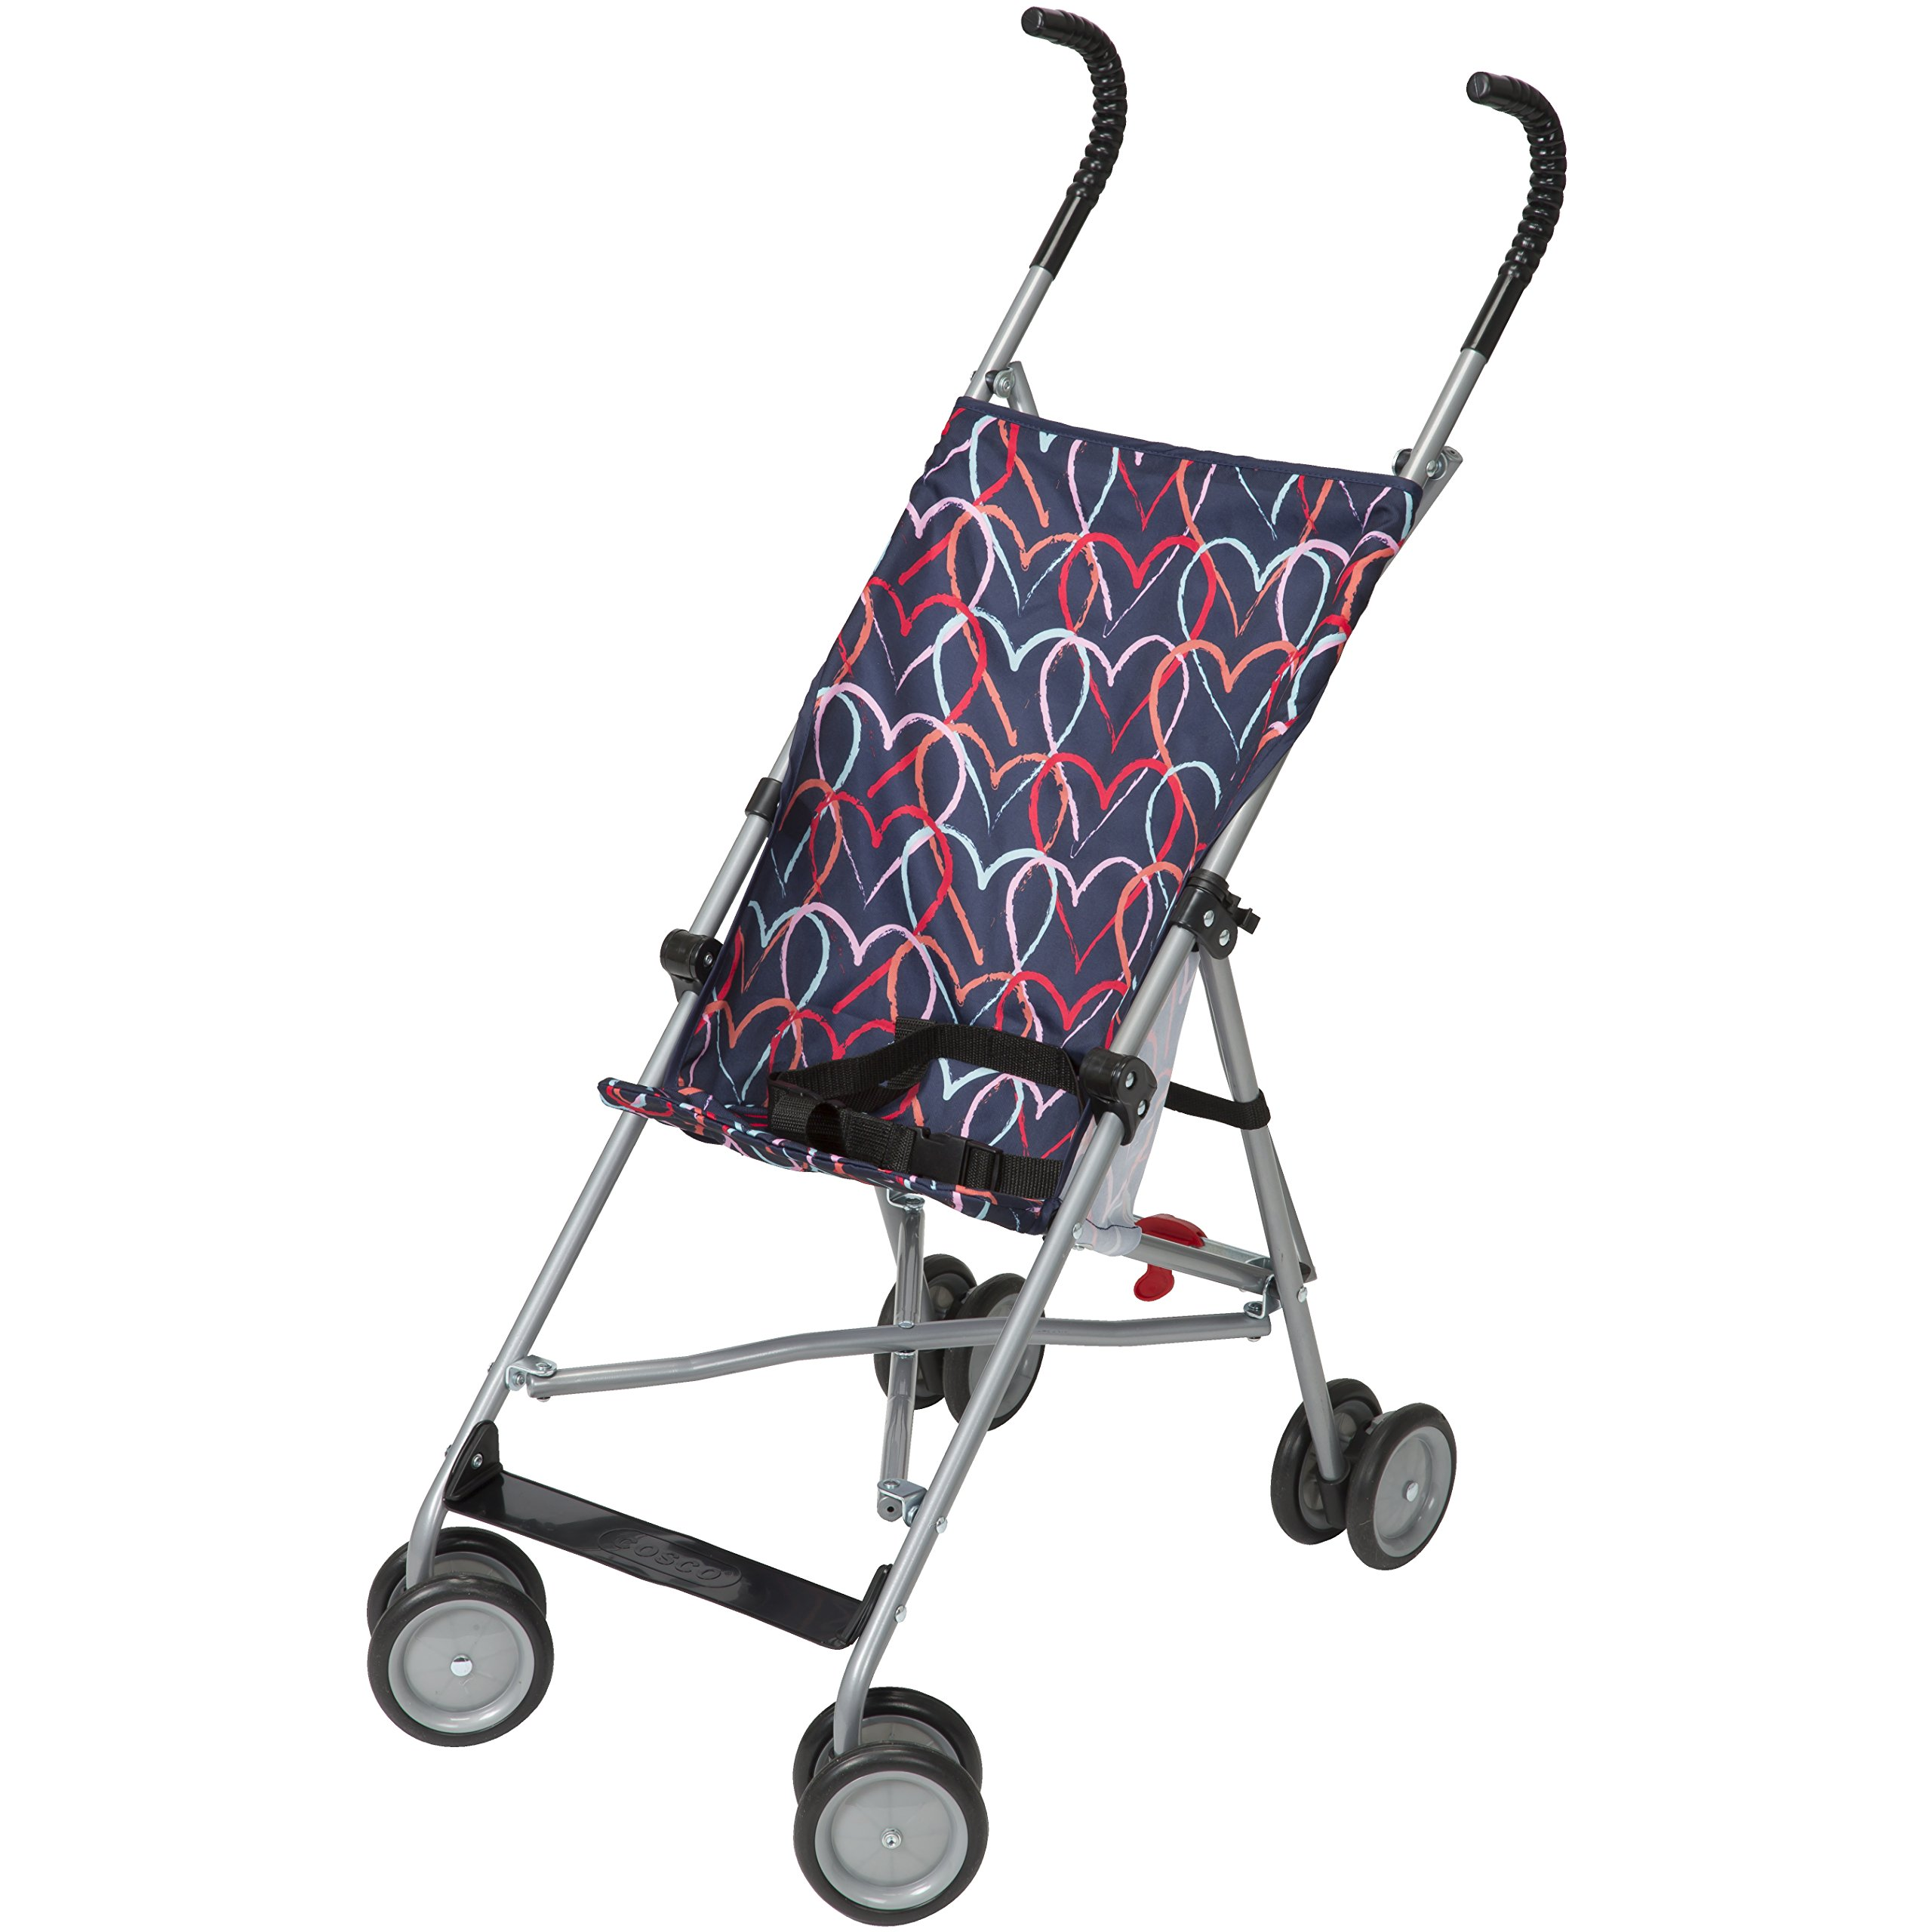 Cosco Umbrella Stroller, Chalk Hearts by Cosco (Image #4)